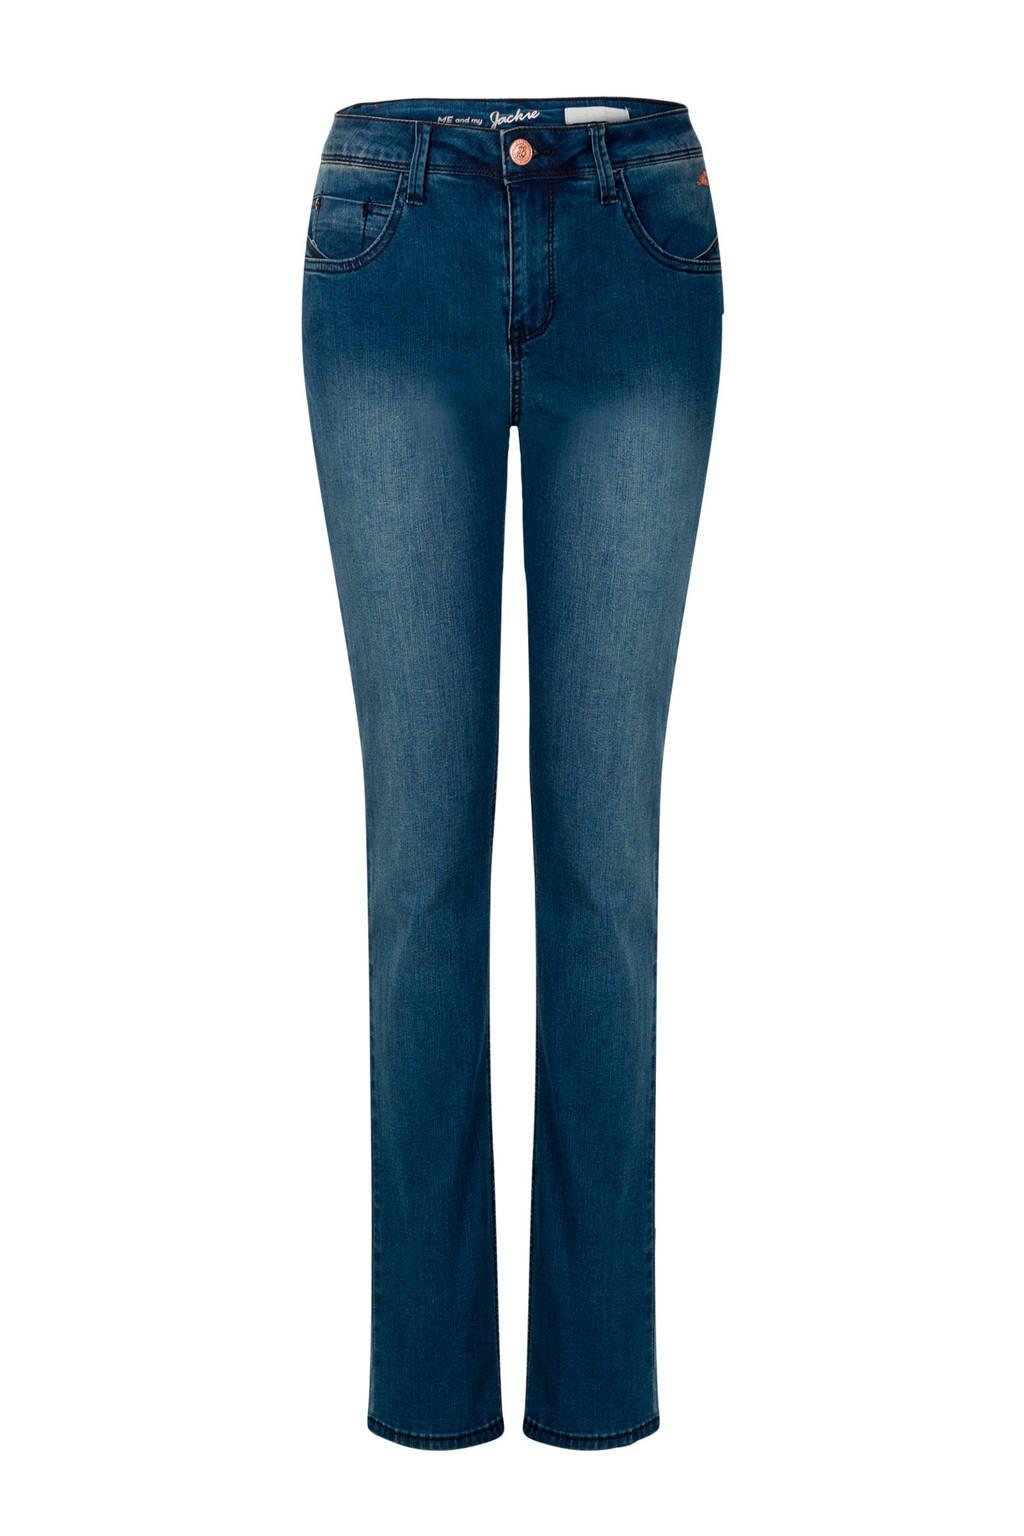 Miss Etam Regulier straight fit jeans Jackie blauw, Blauw